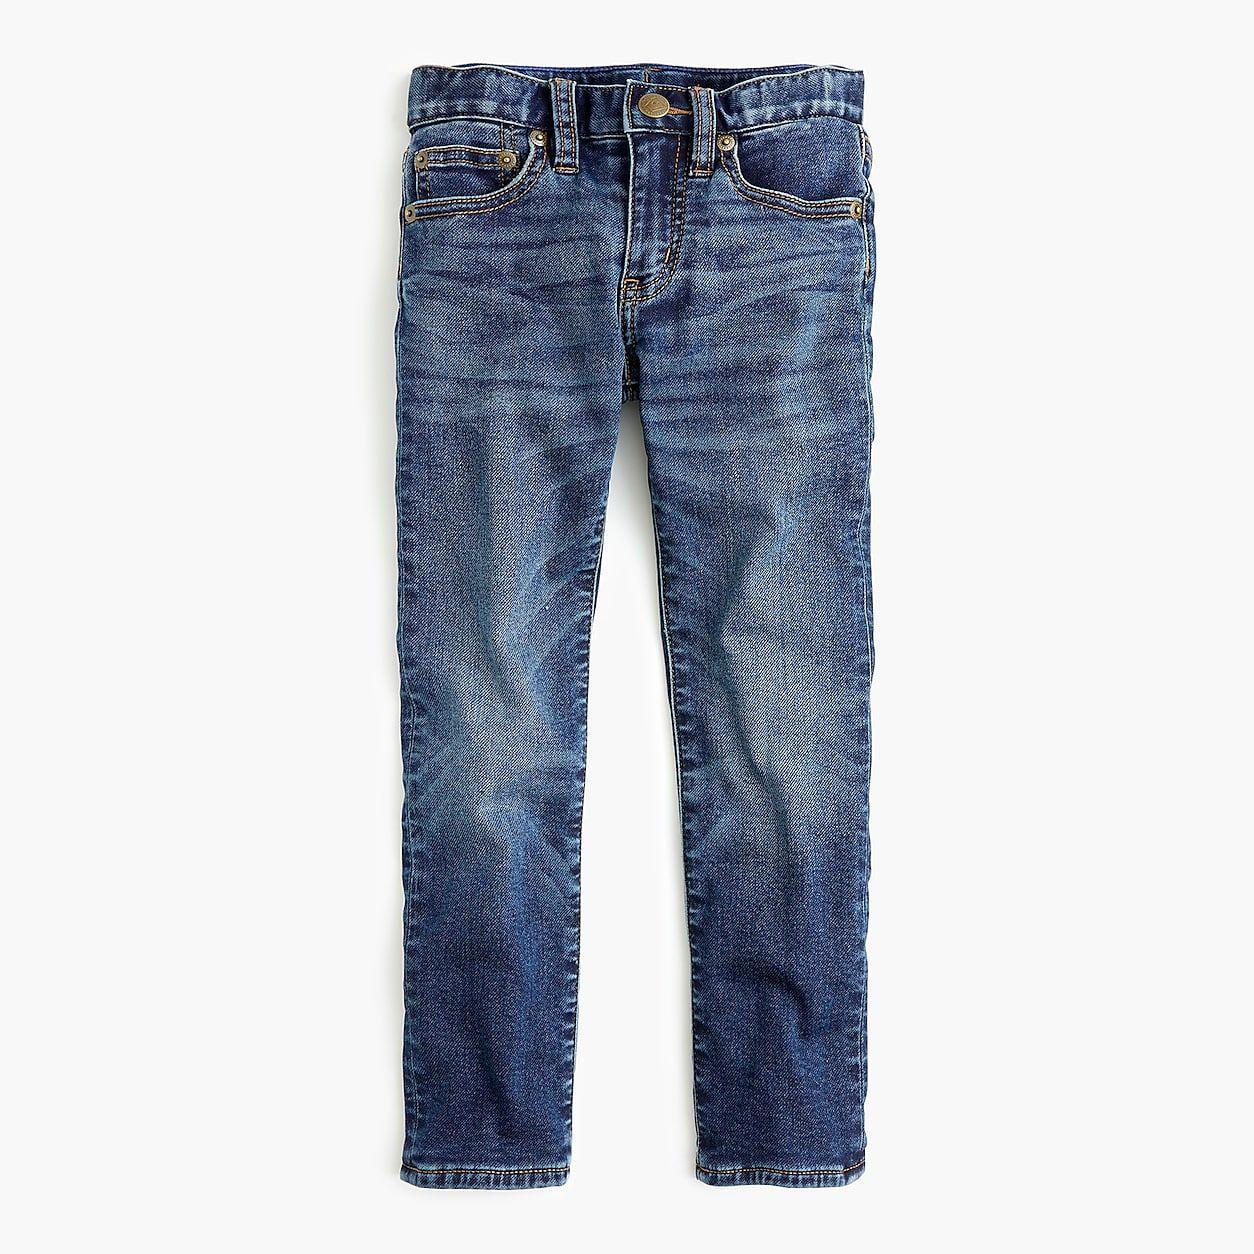 LOOK by crewcuts Boys Slim Fit Jean